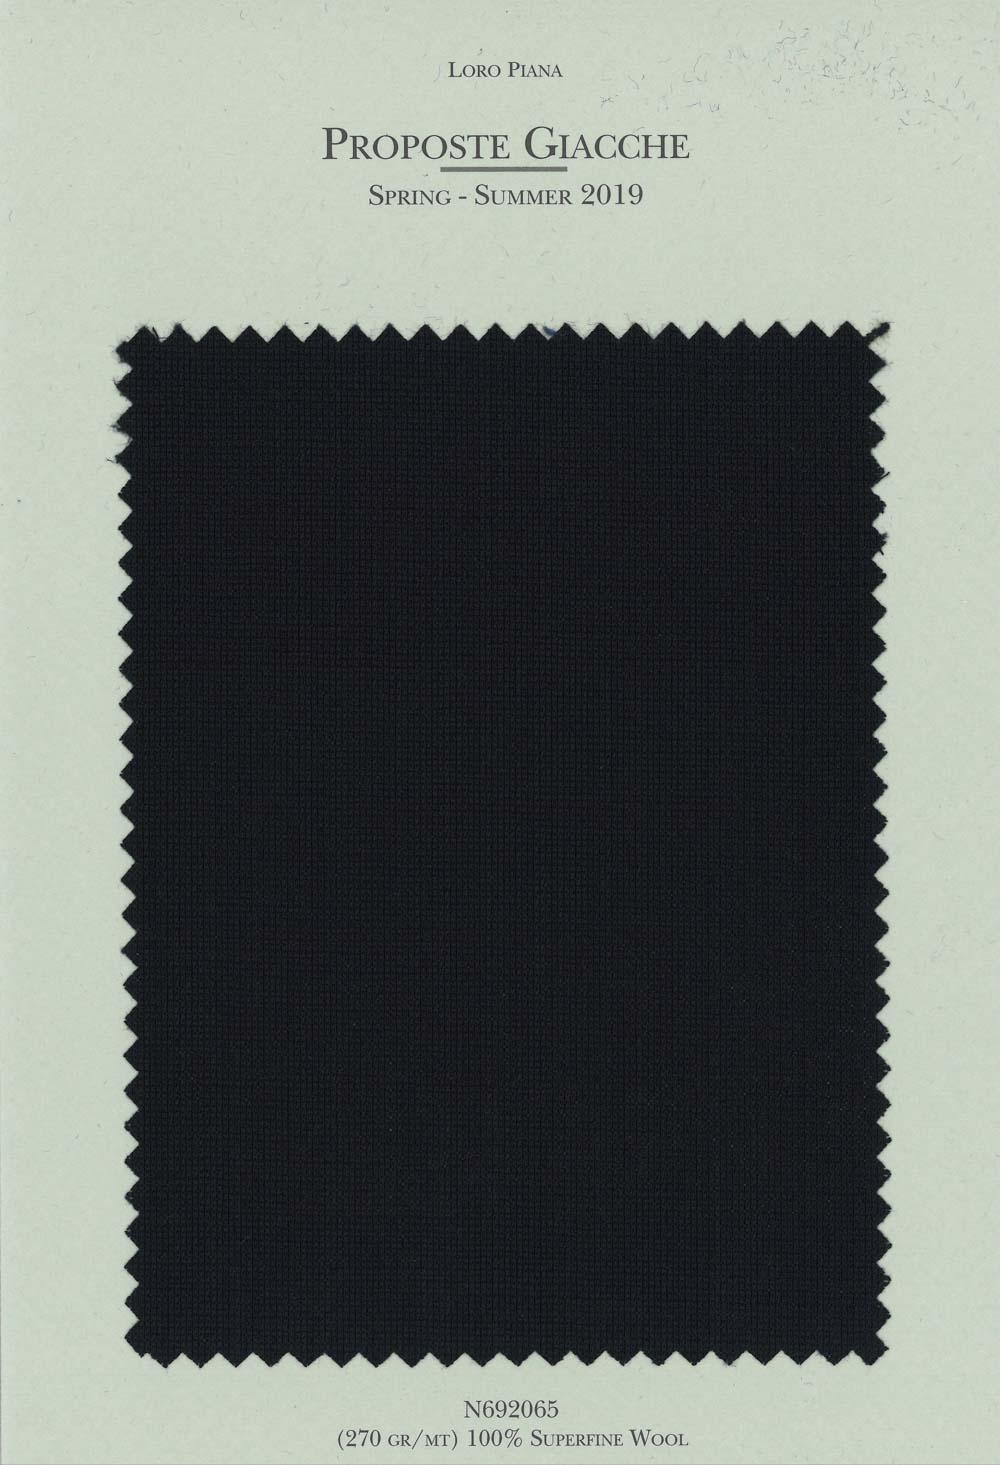 N692065